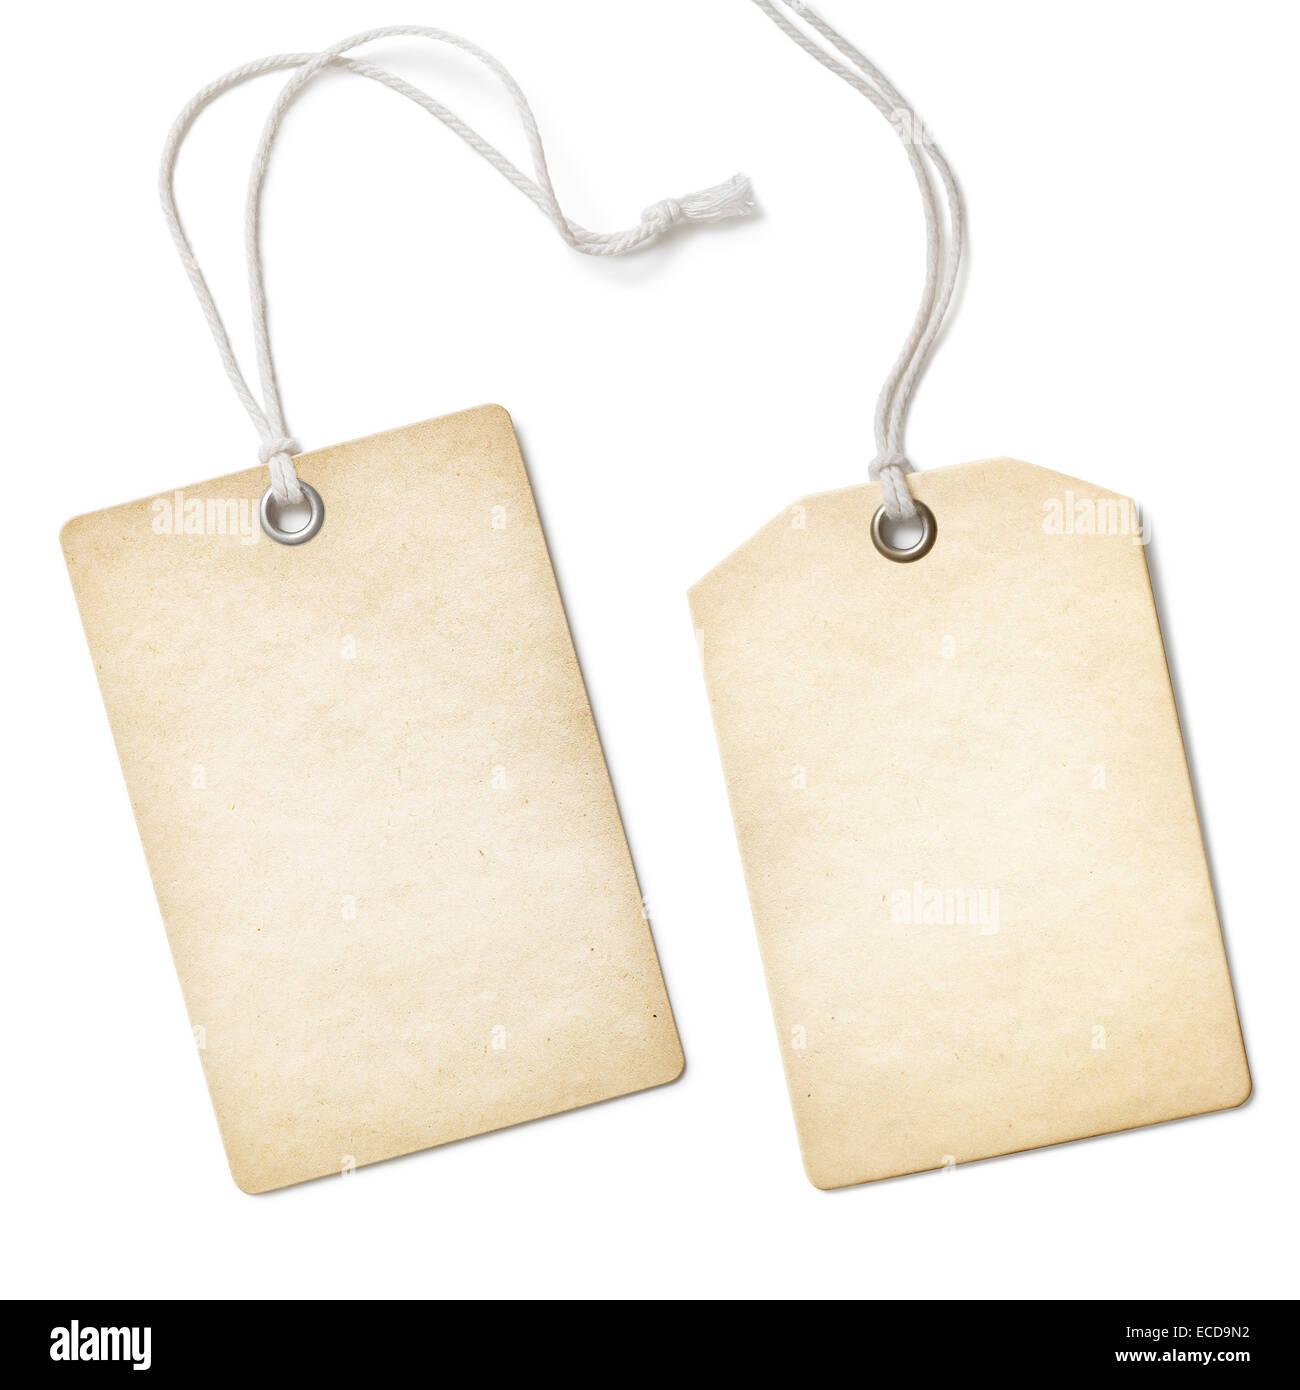 Blanco paño de papel antigua etiqueta o conjunto de etiquetas aislado en blanco Foto de stock